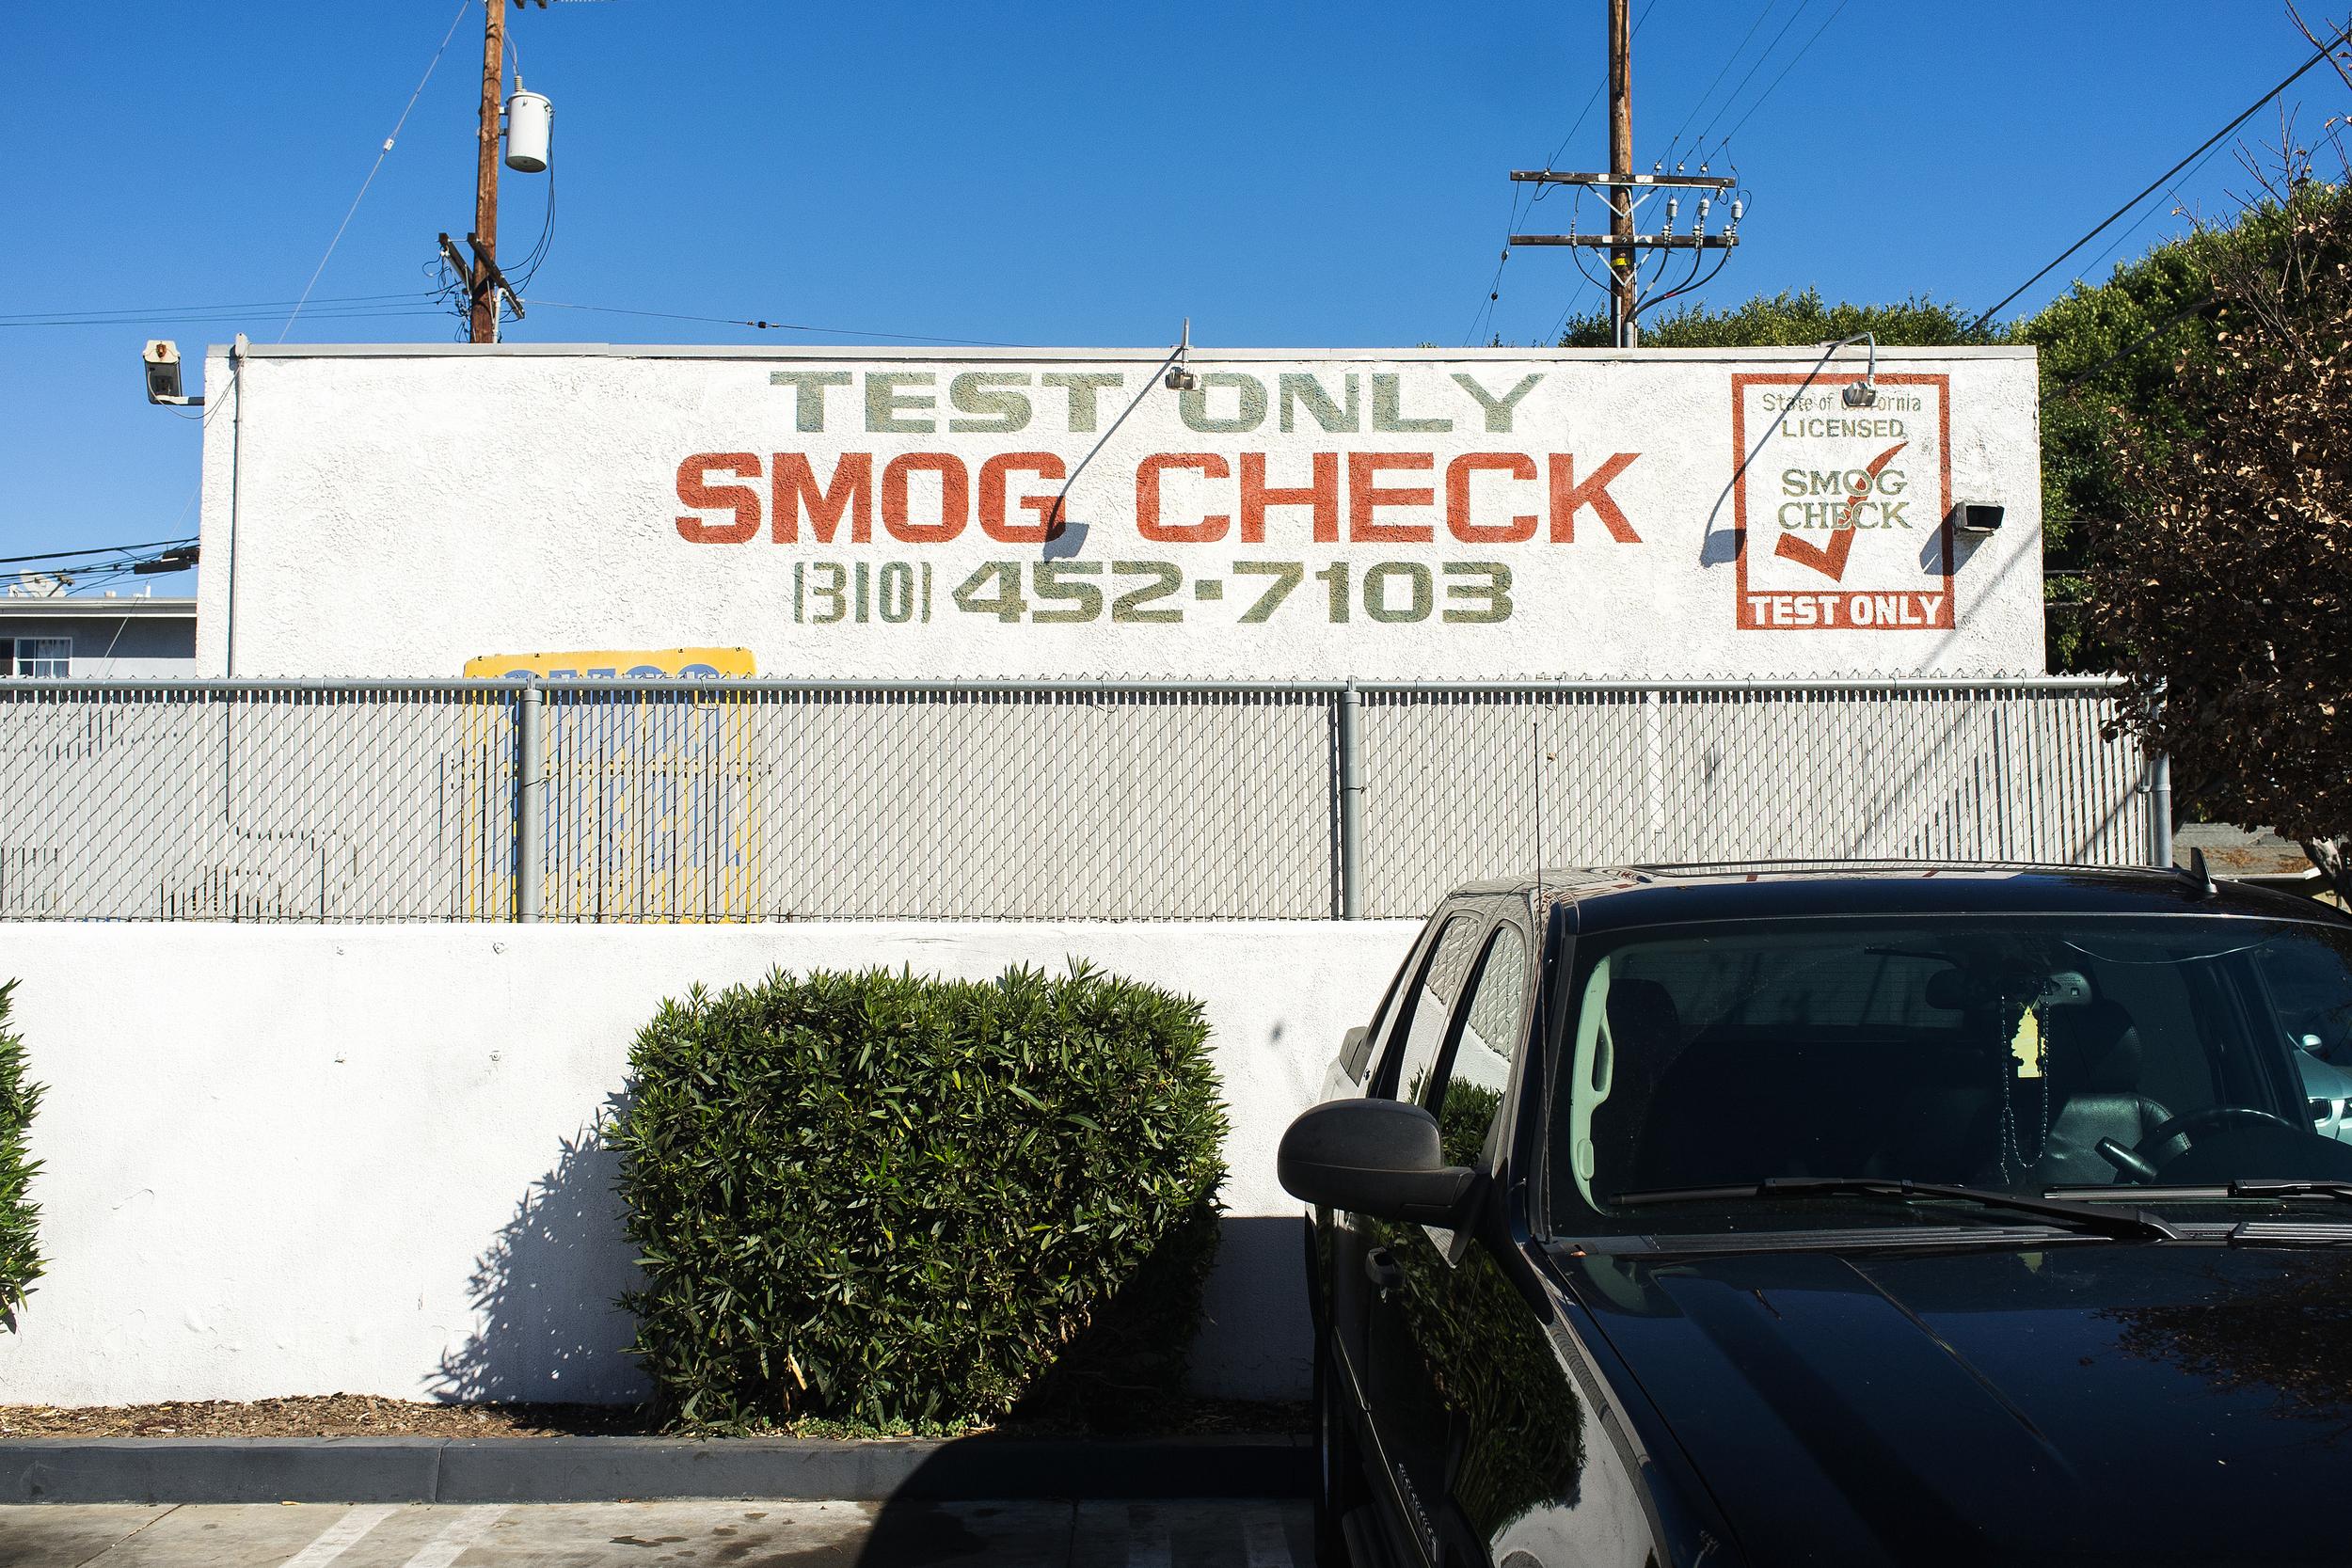 Test Only Smog Check.jpg